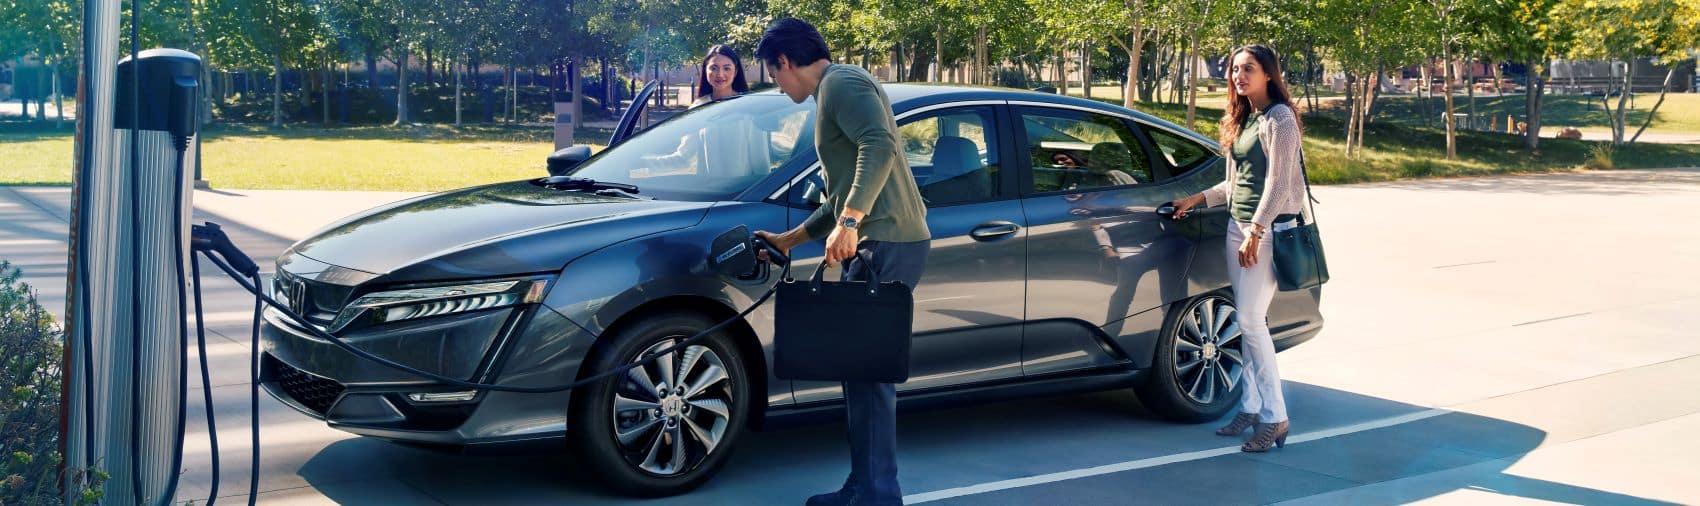 Honda Clarity EV charging